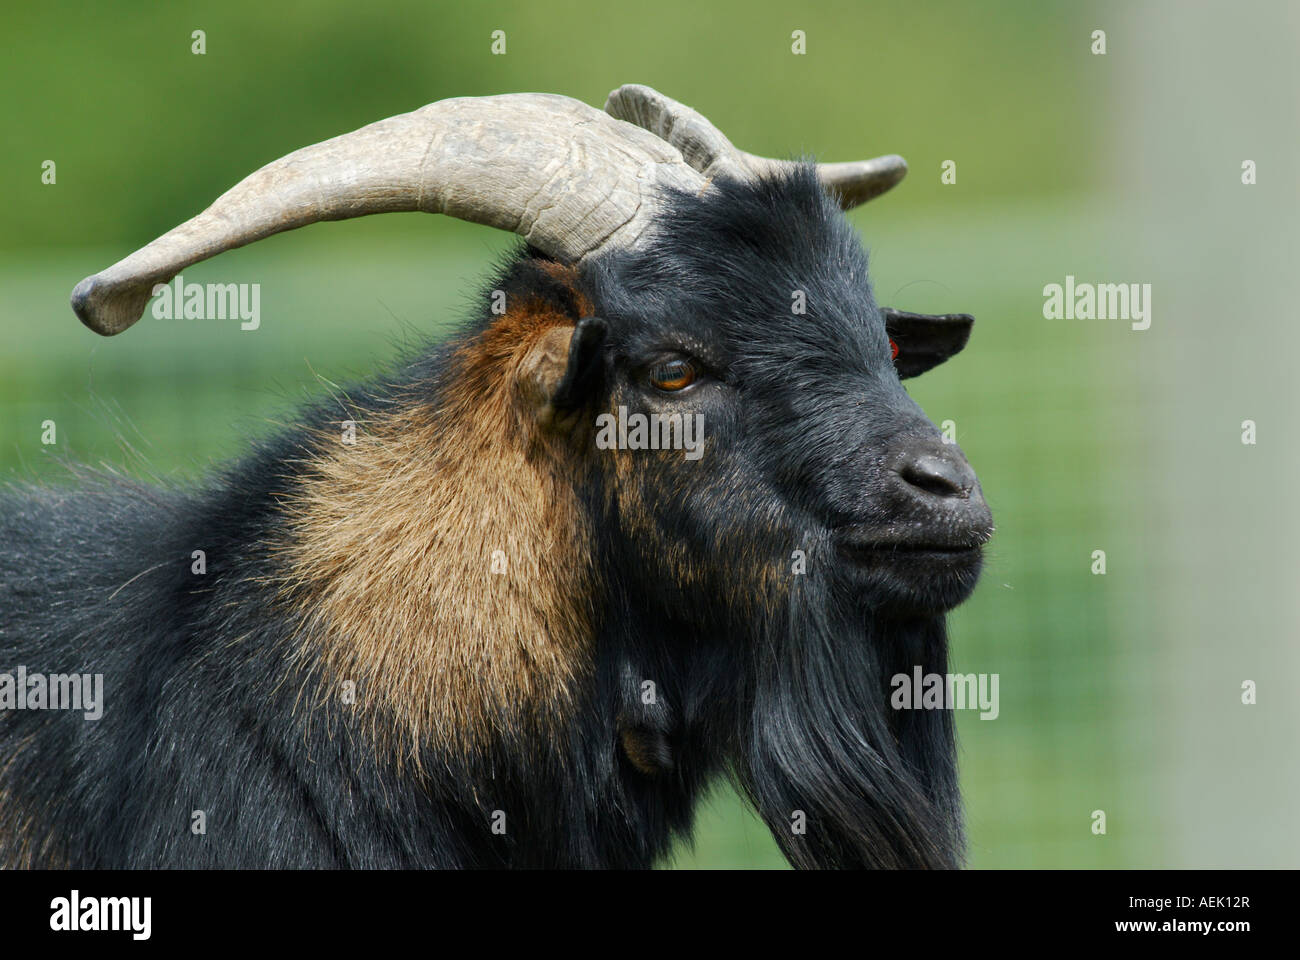 Male goat west african pygmy goat Stock Photo - Alamy